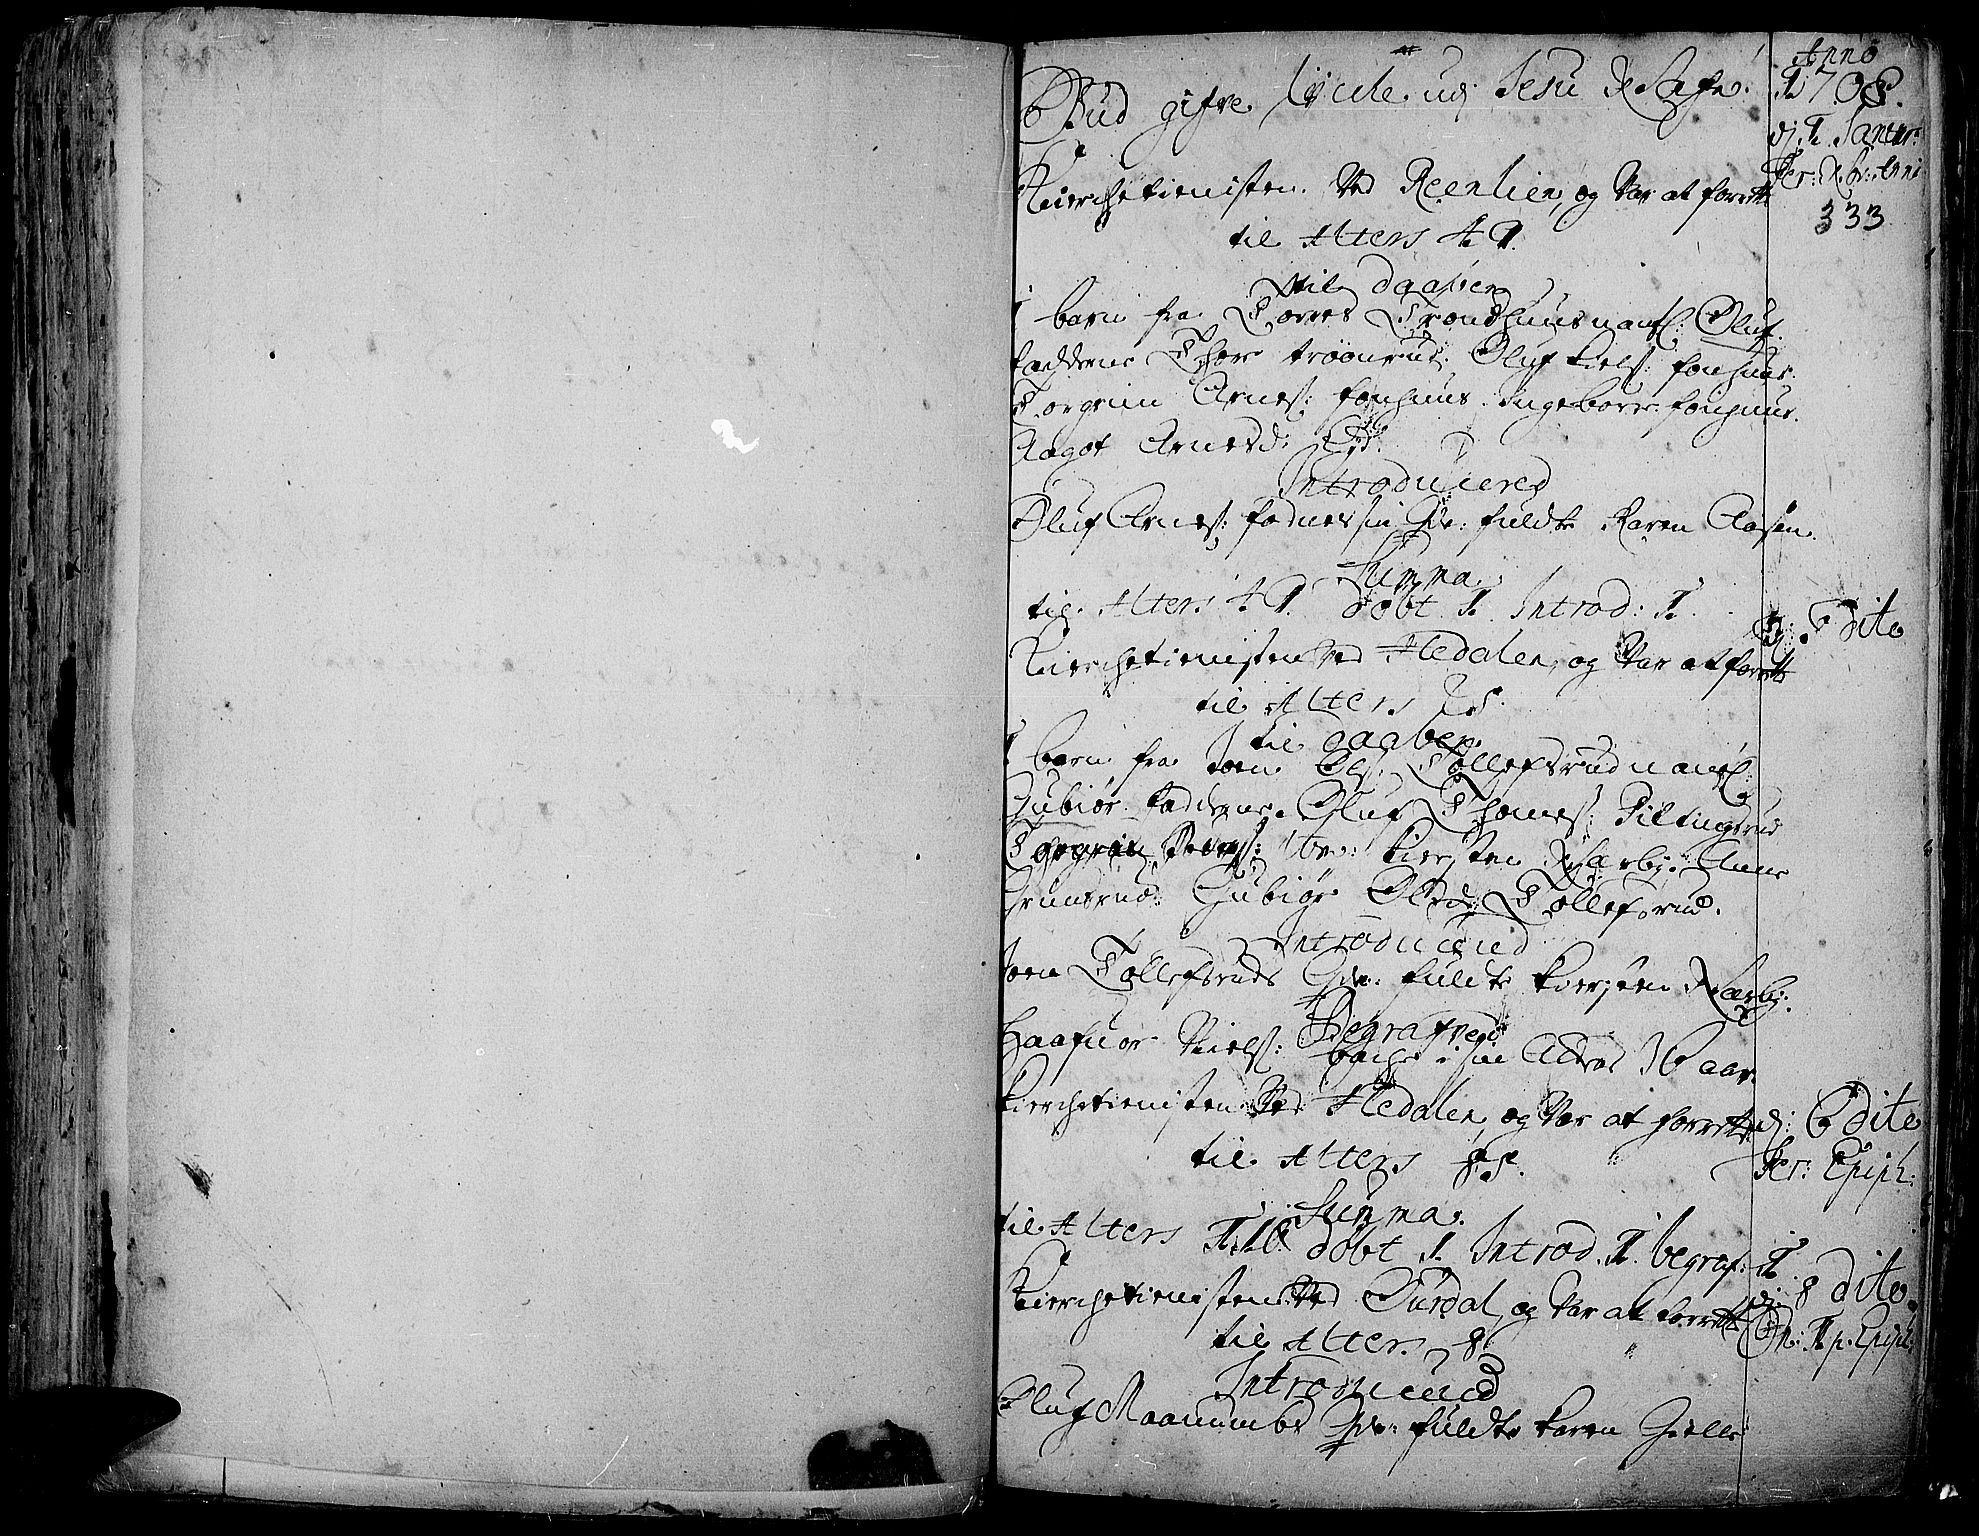 SAH, Aurdal prestekontor, Ministerialbok nr. 1-3, 1692-1730, s. 333